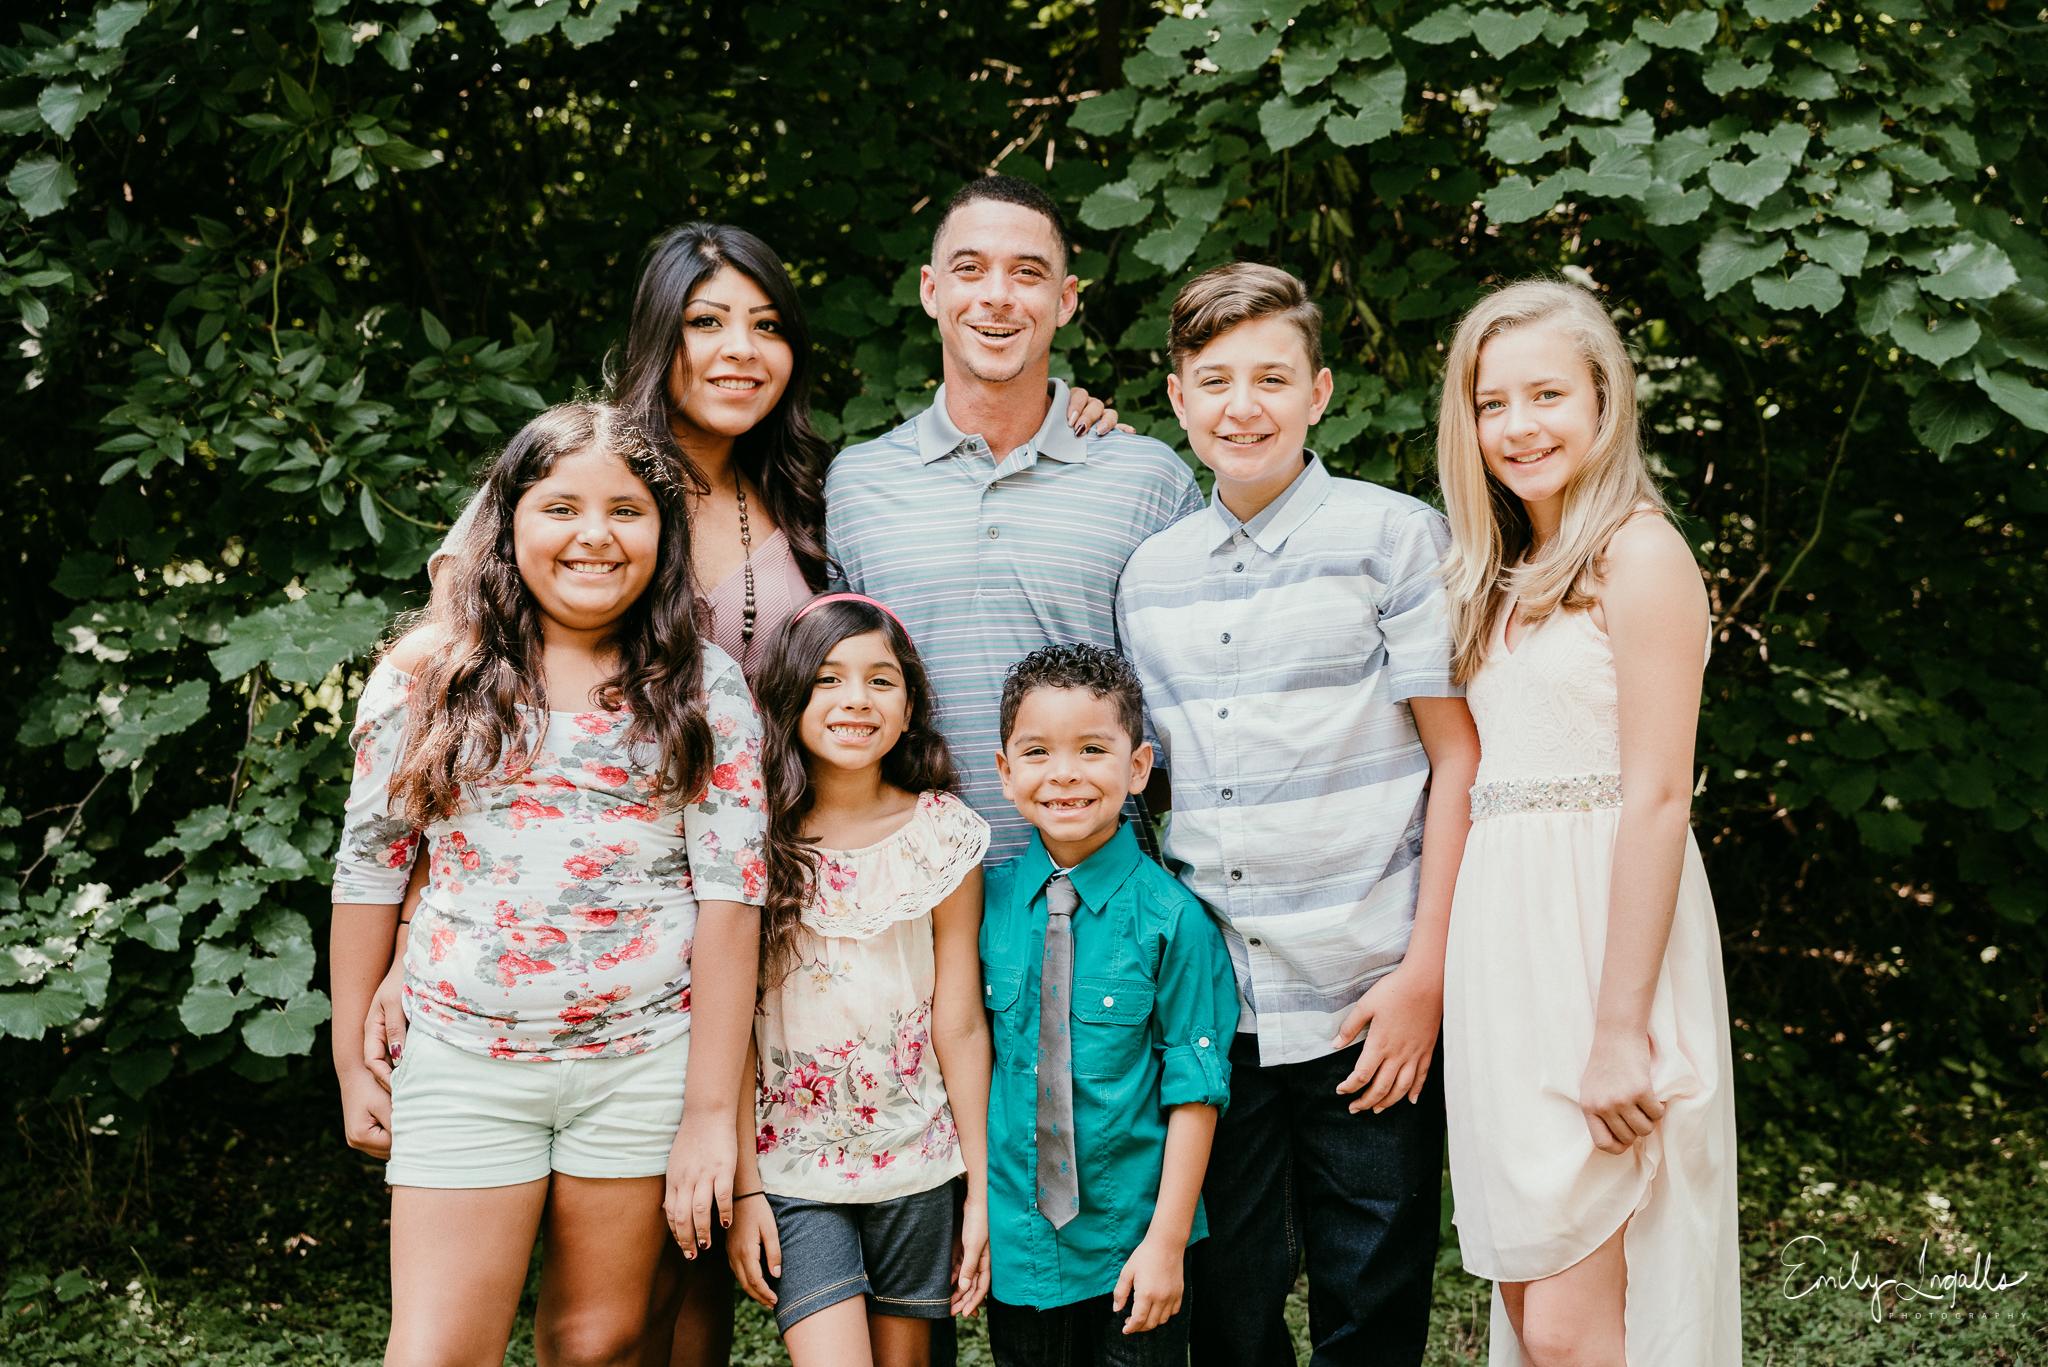 Family Photographer_Round Rock Family Photographer_Emily Ingalls Photography_Austin Family Photographer_Pflugerville Family Photographer_Georgetown Photographer-10.jpg